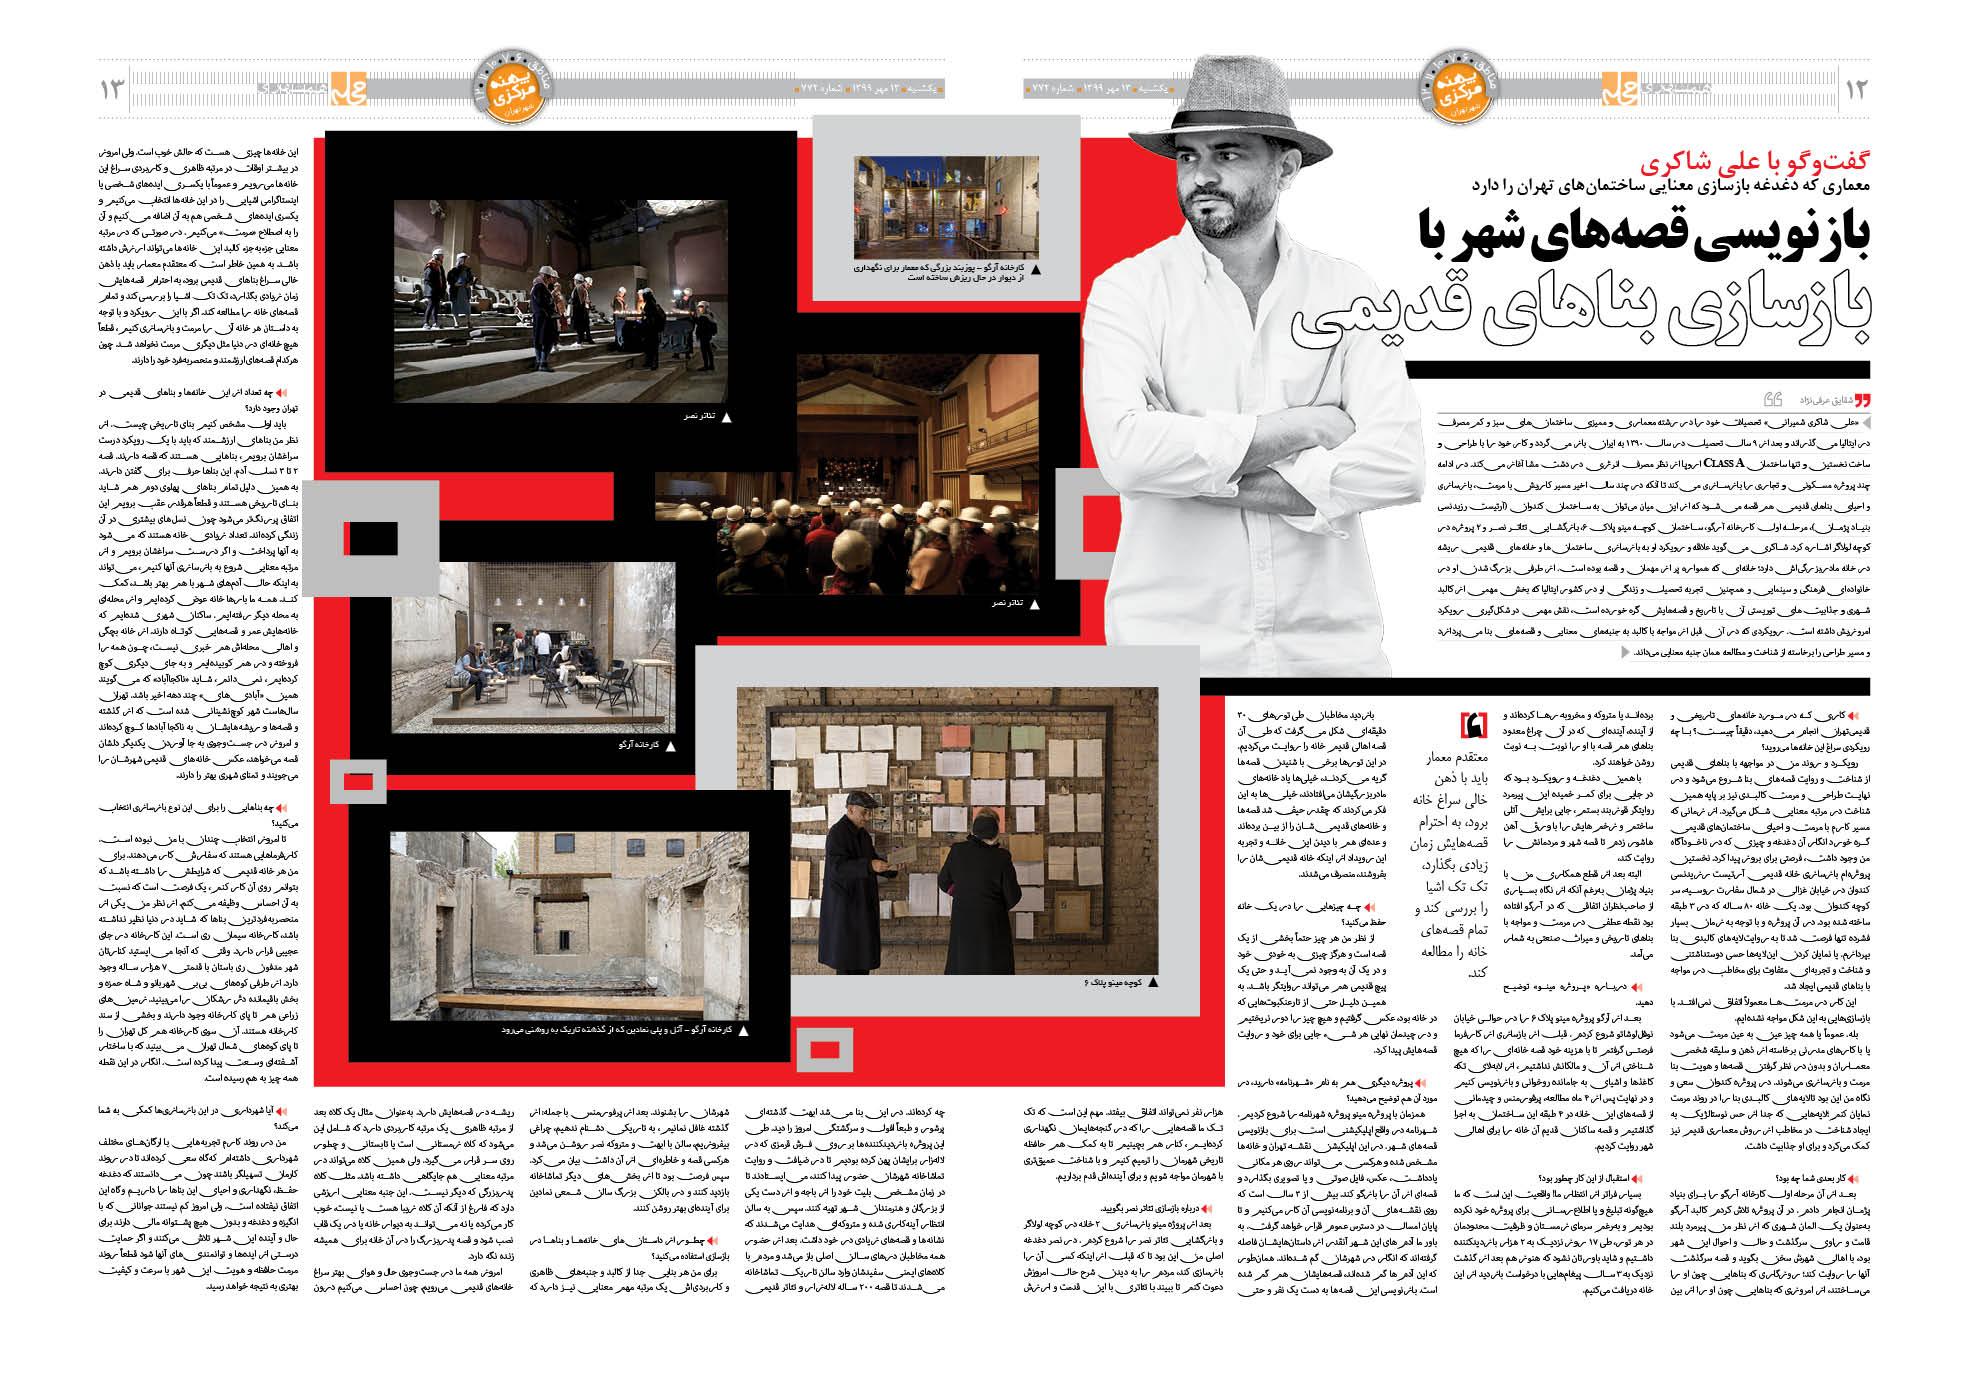 صفحه 13 -12محله